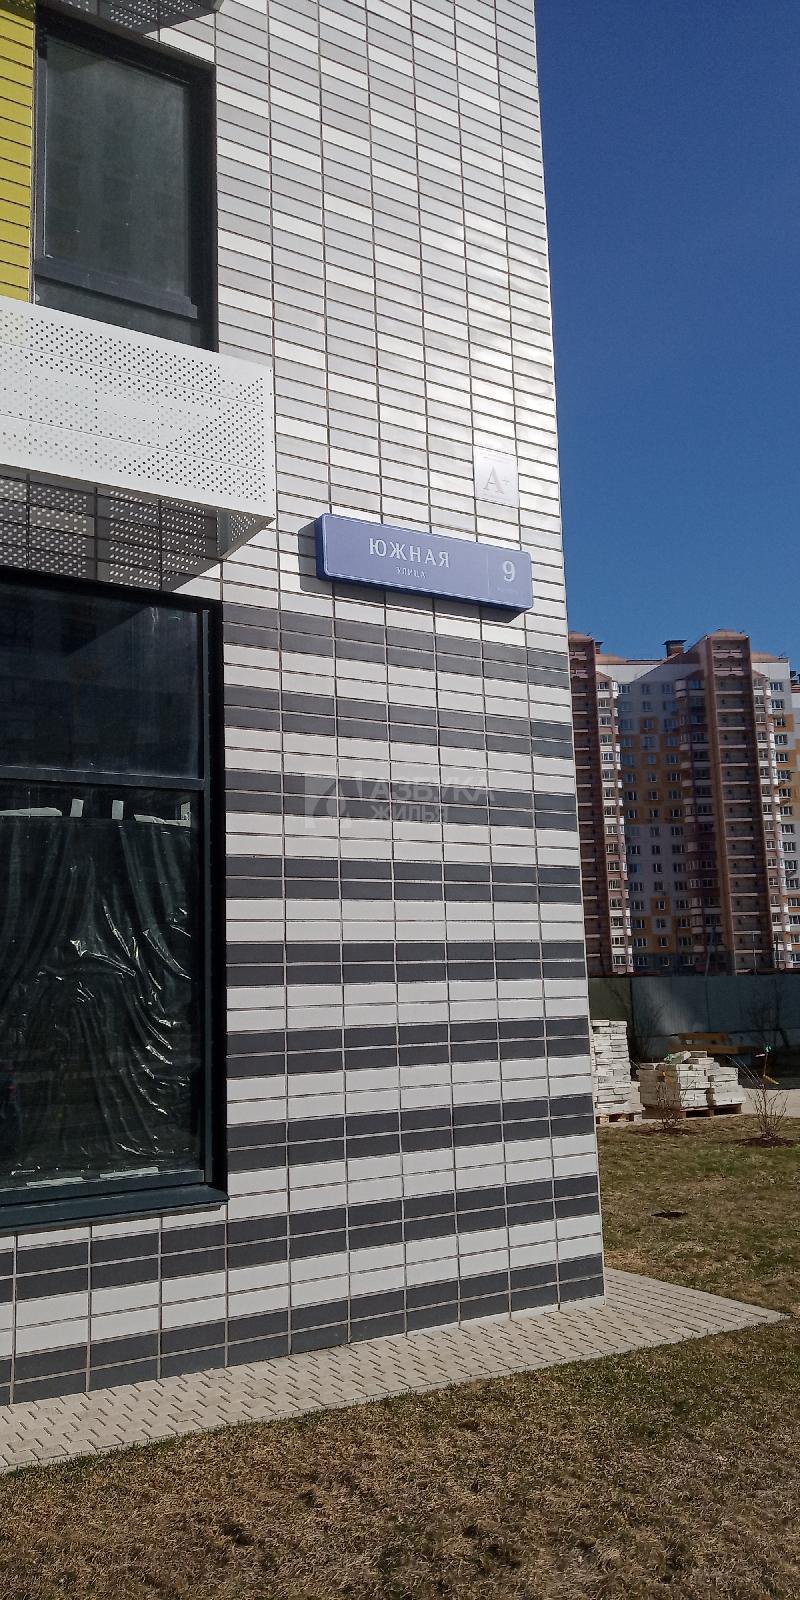 Фото №1 - 1-комнатная квартира, Дрожжино, Южная улица 9 корпус 1, метро Бульвар Дмитрия Донского